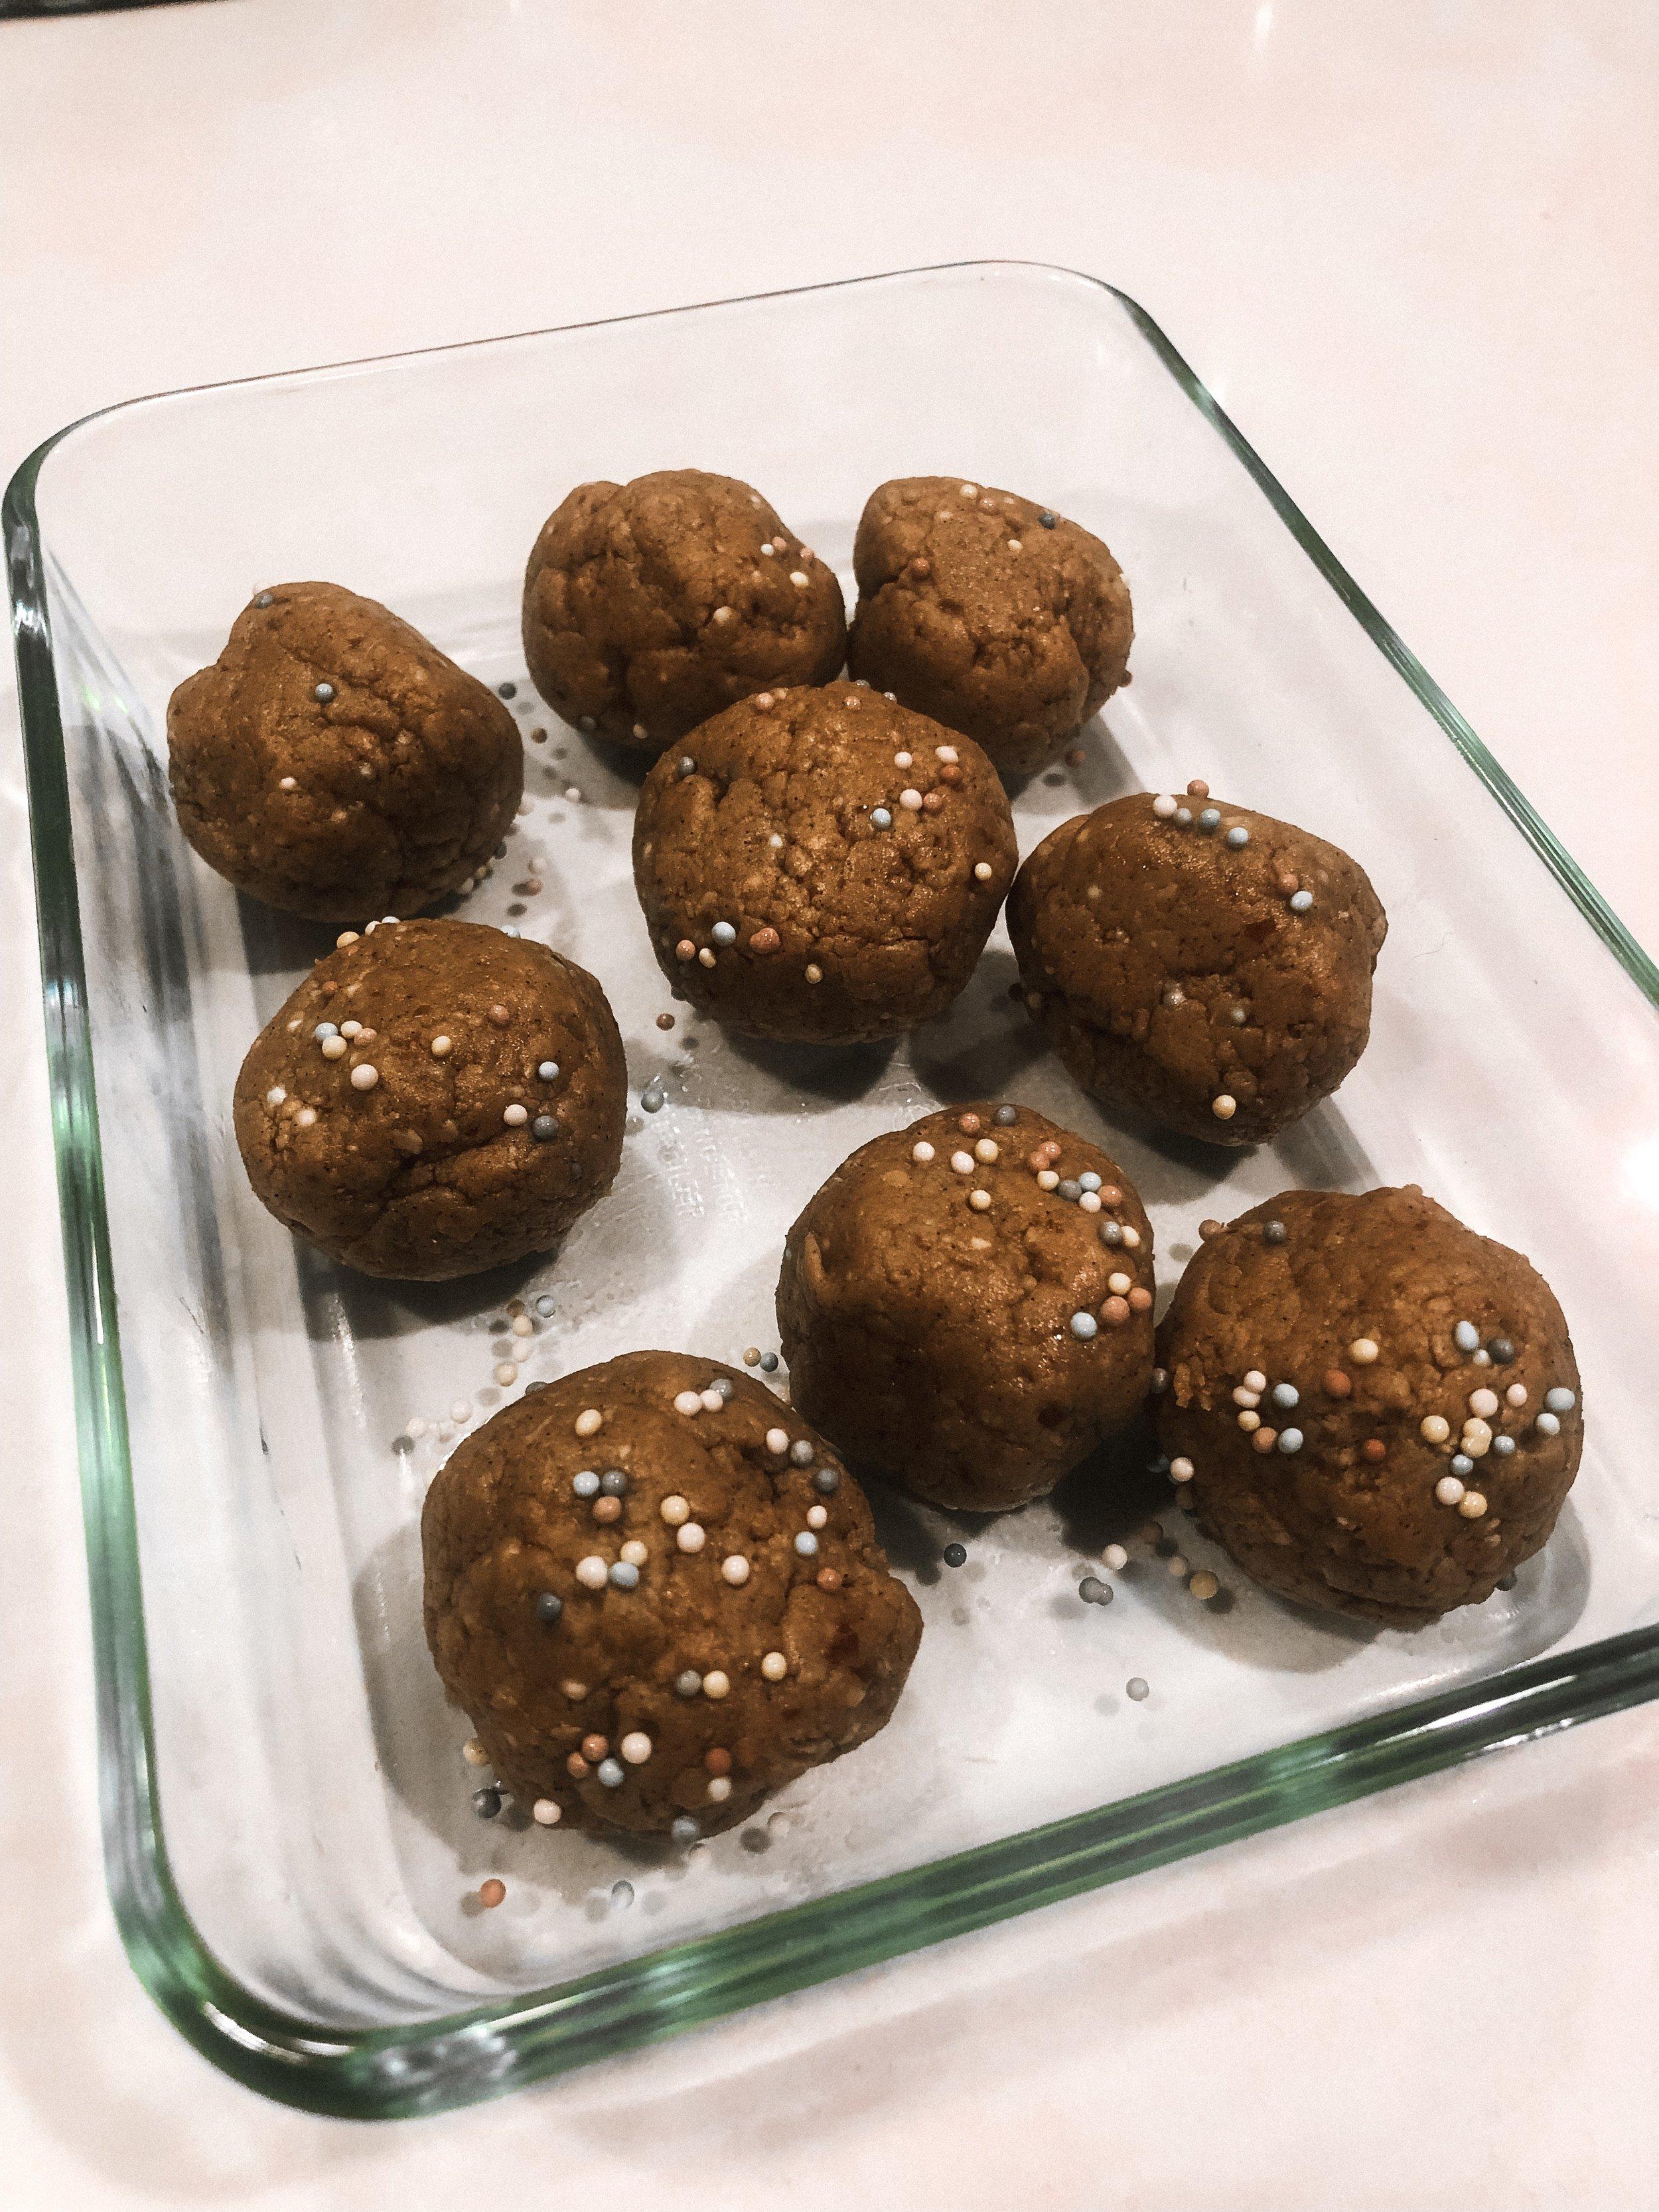 vegan gluten free refined sugar free cake batter energy ball recipe